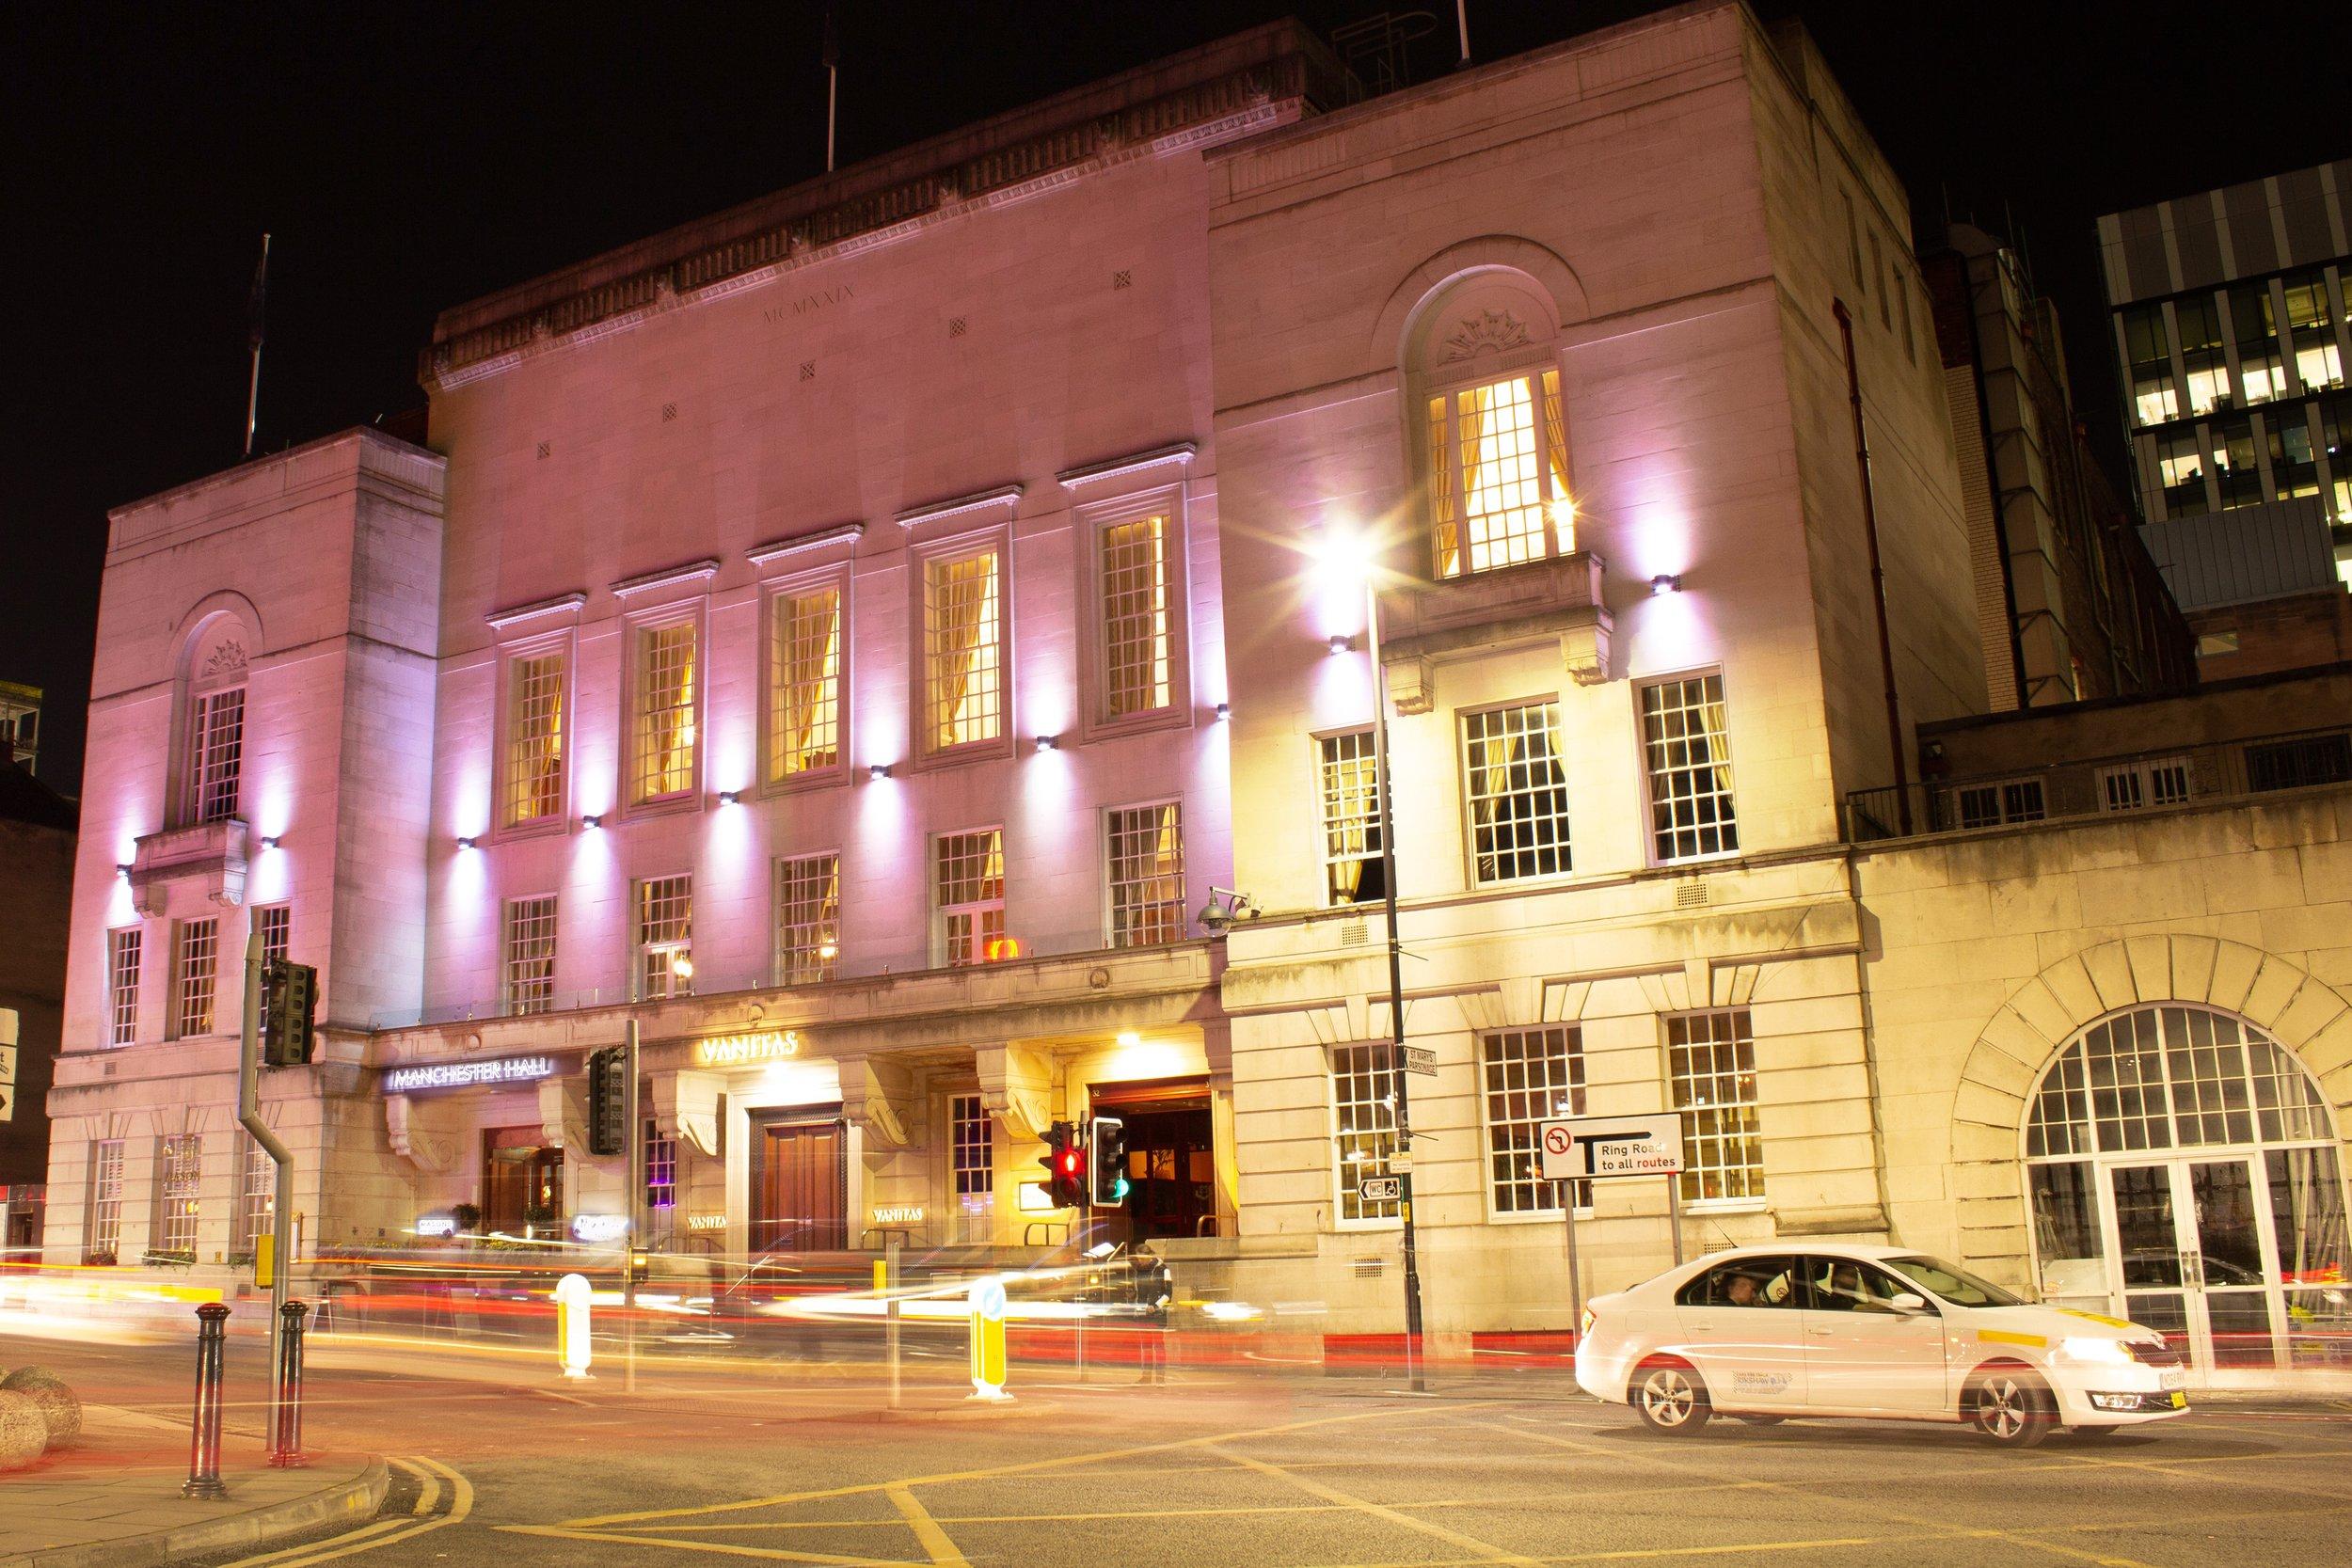 Manchester Hall